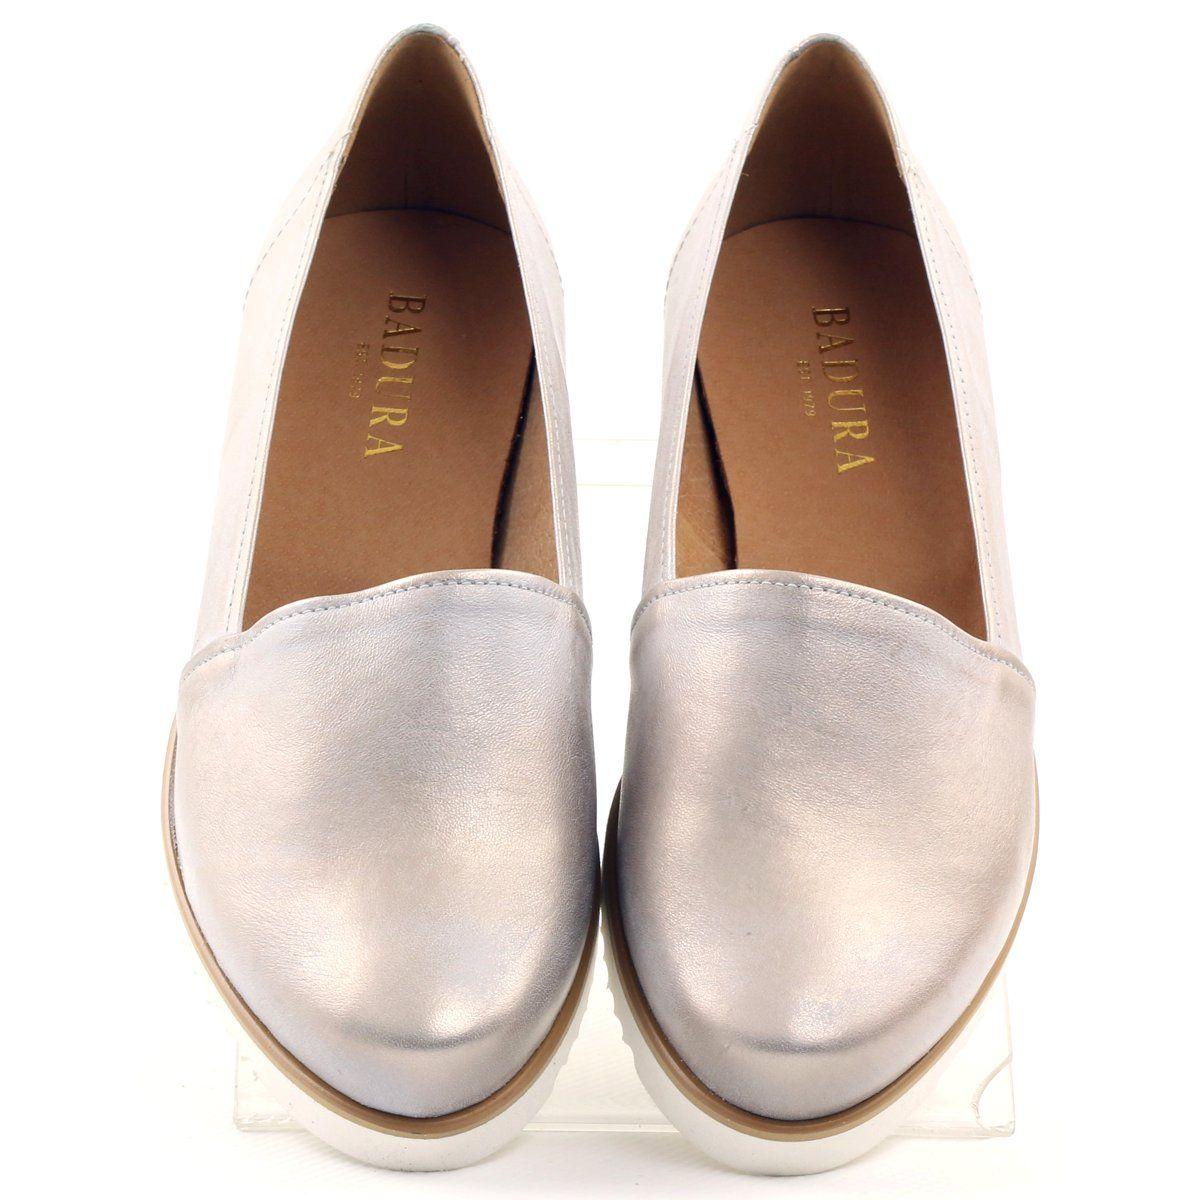 Polbuty Damskie Badura Bezowo Zlote Bezowy Zloty Women Shoes Shoes Shoes Drawing